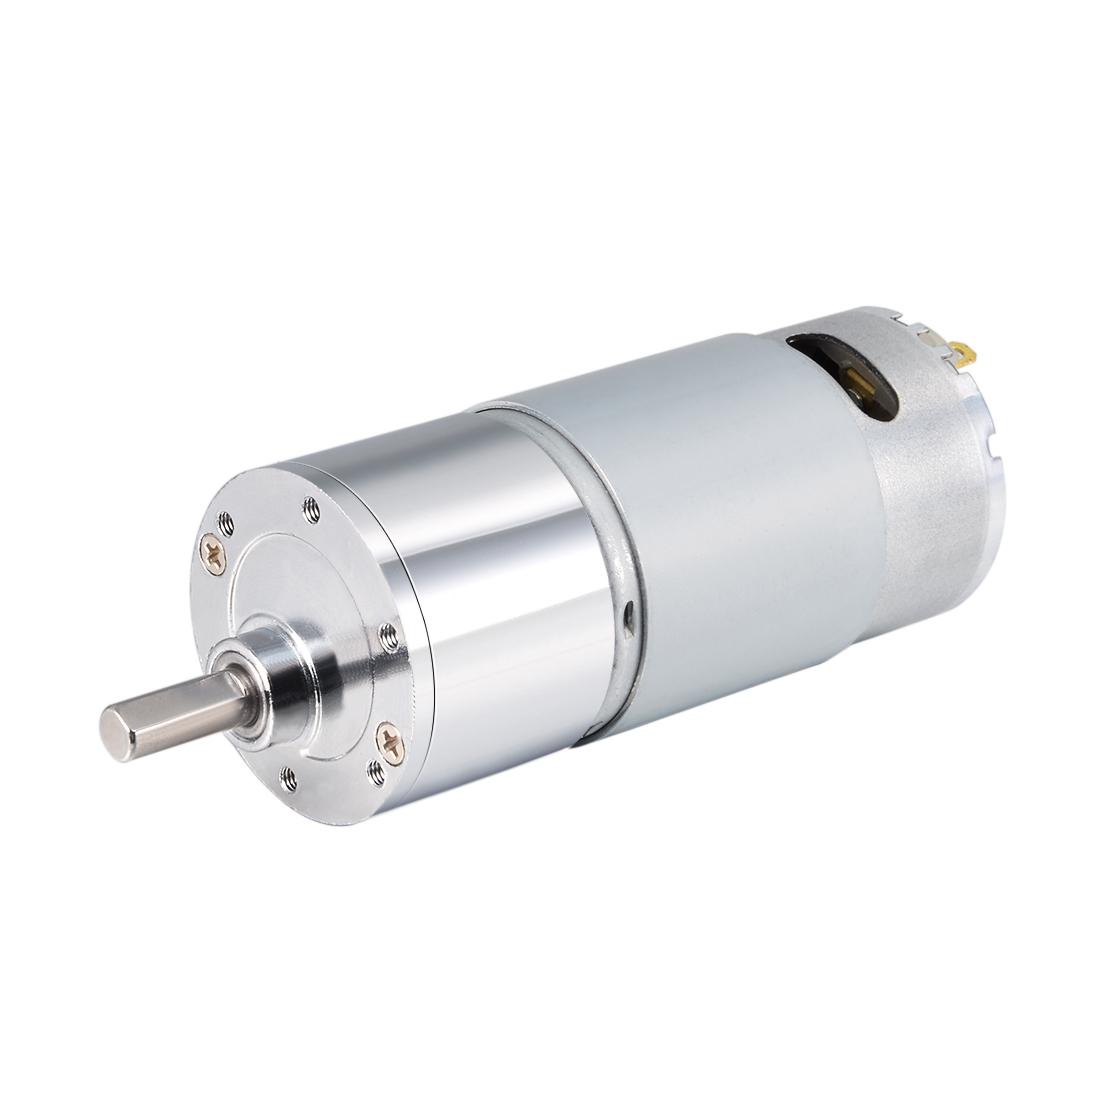 24V DC 300 RPM Gear Motor High Torque Reduction Gearbox Eccentric Output D Shaft